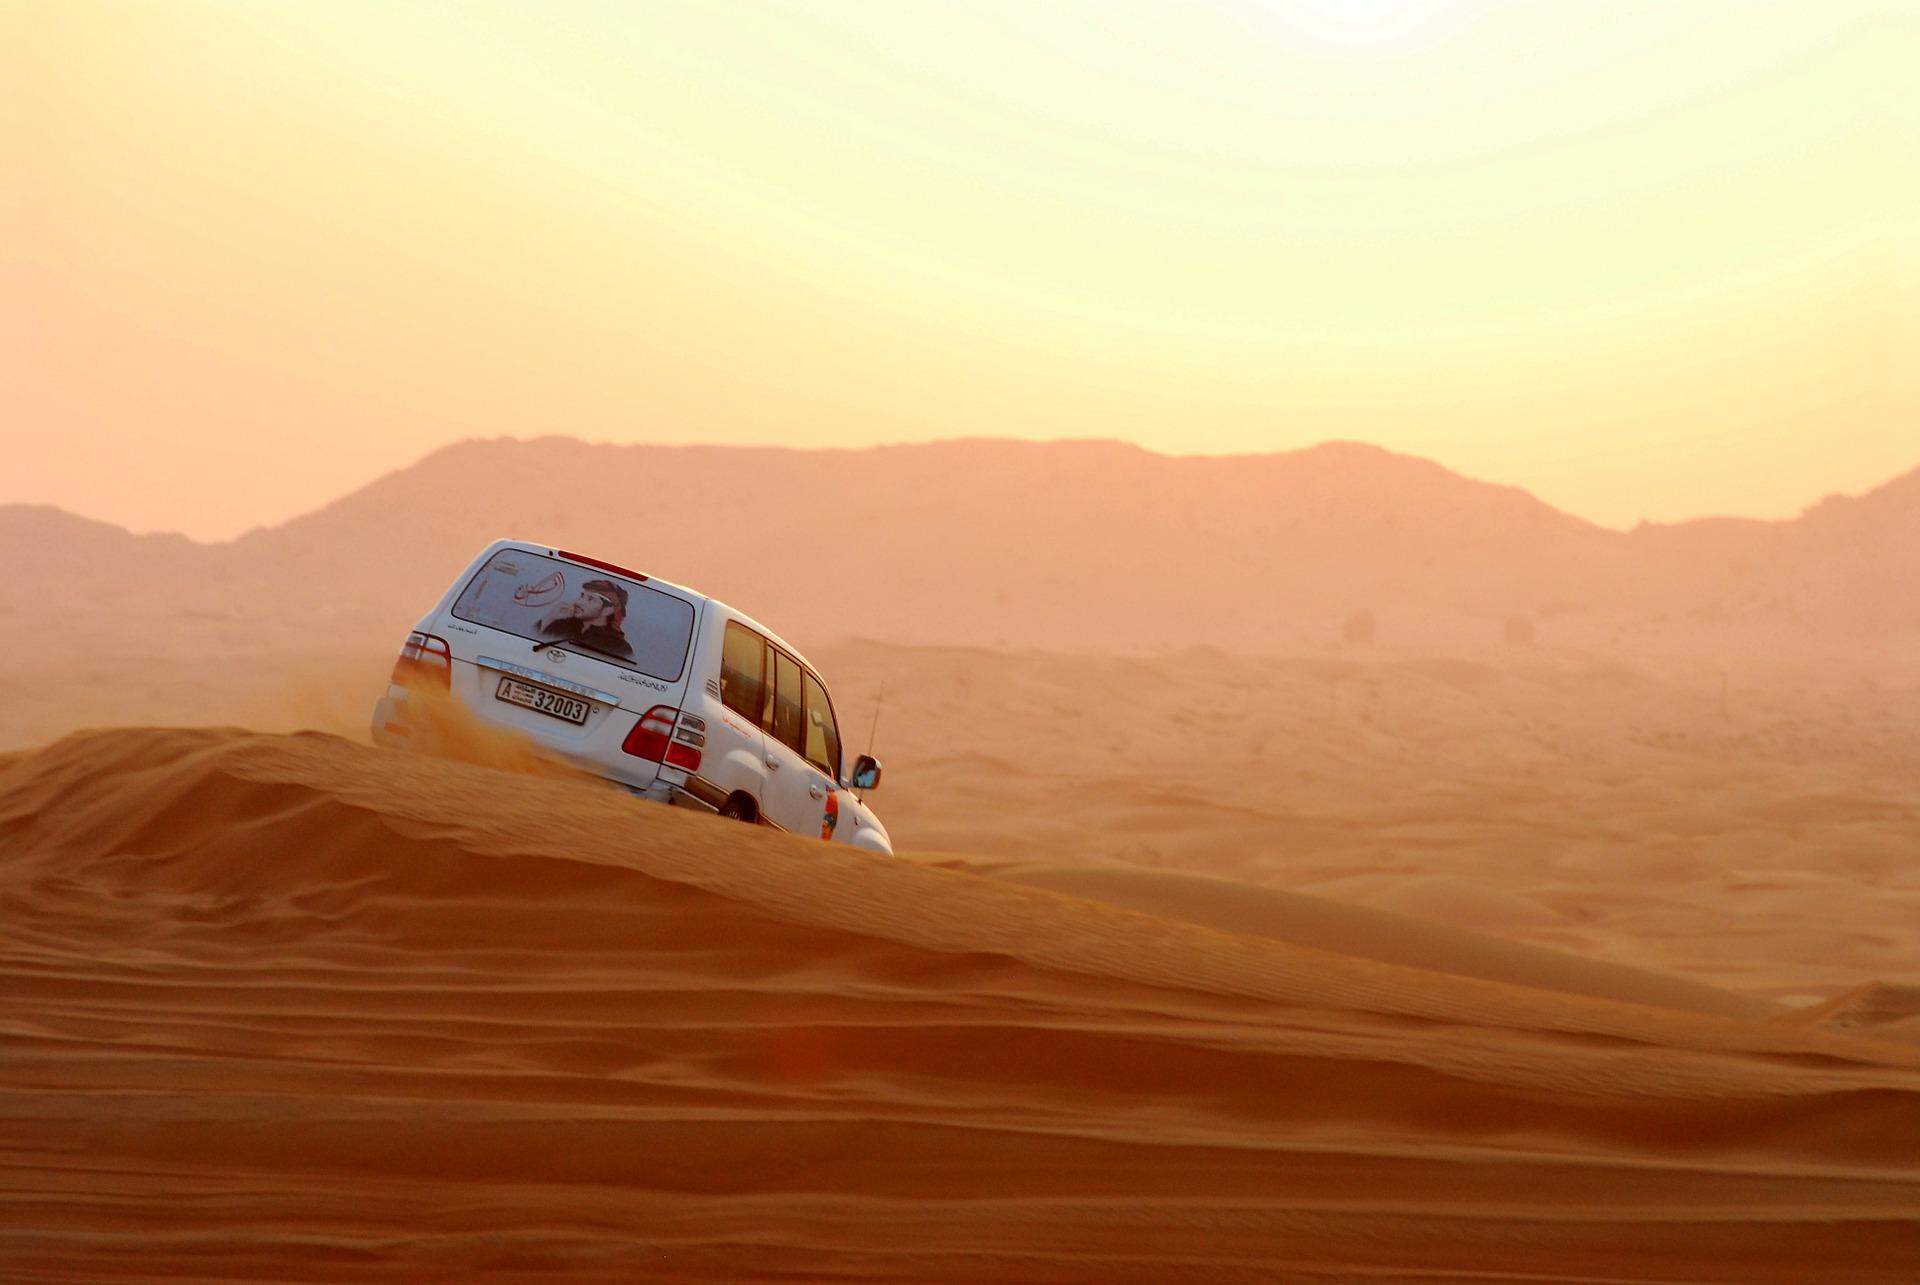 Rondreis Dubai, Abu Dhabi en woestijn